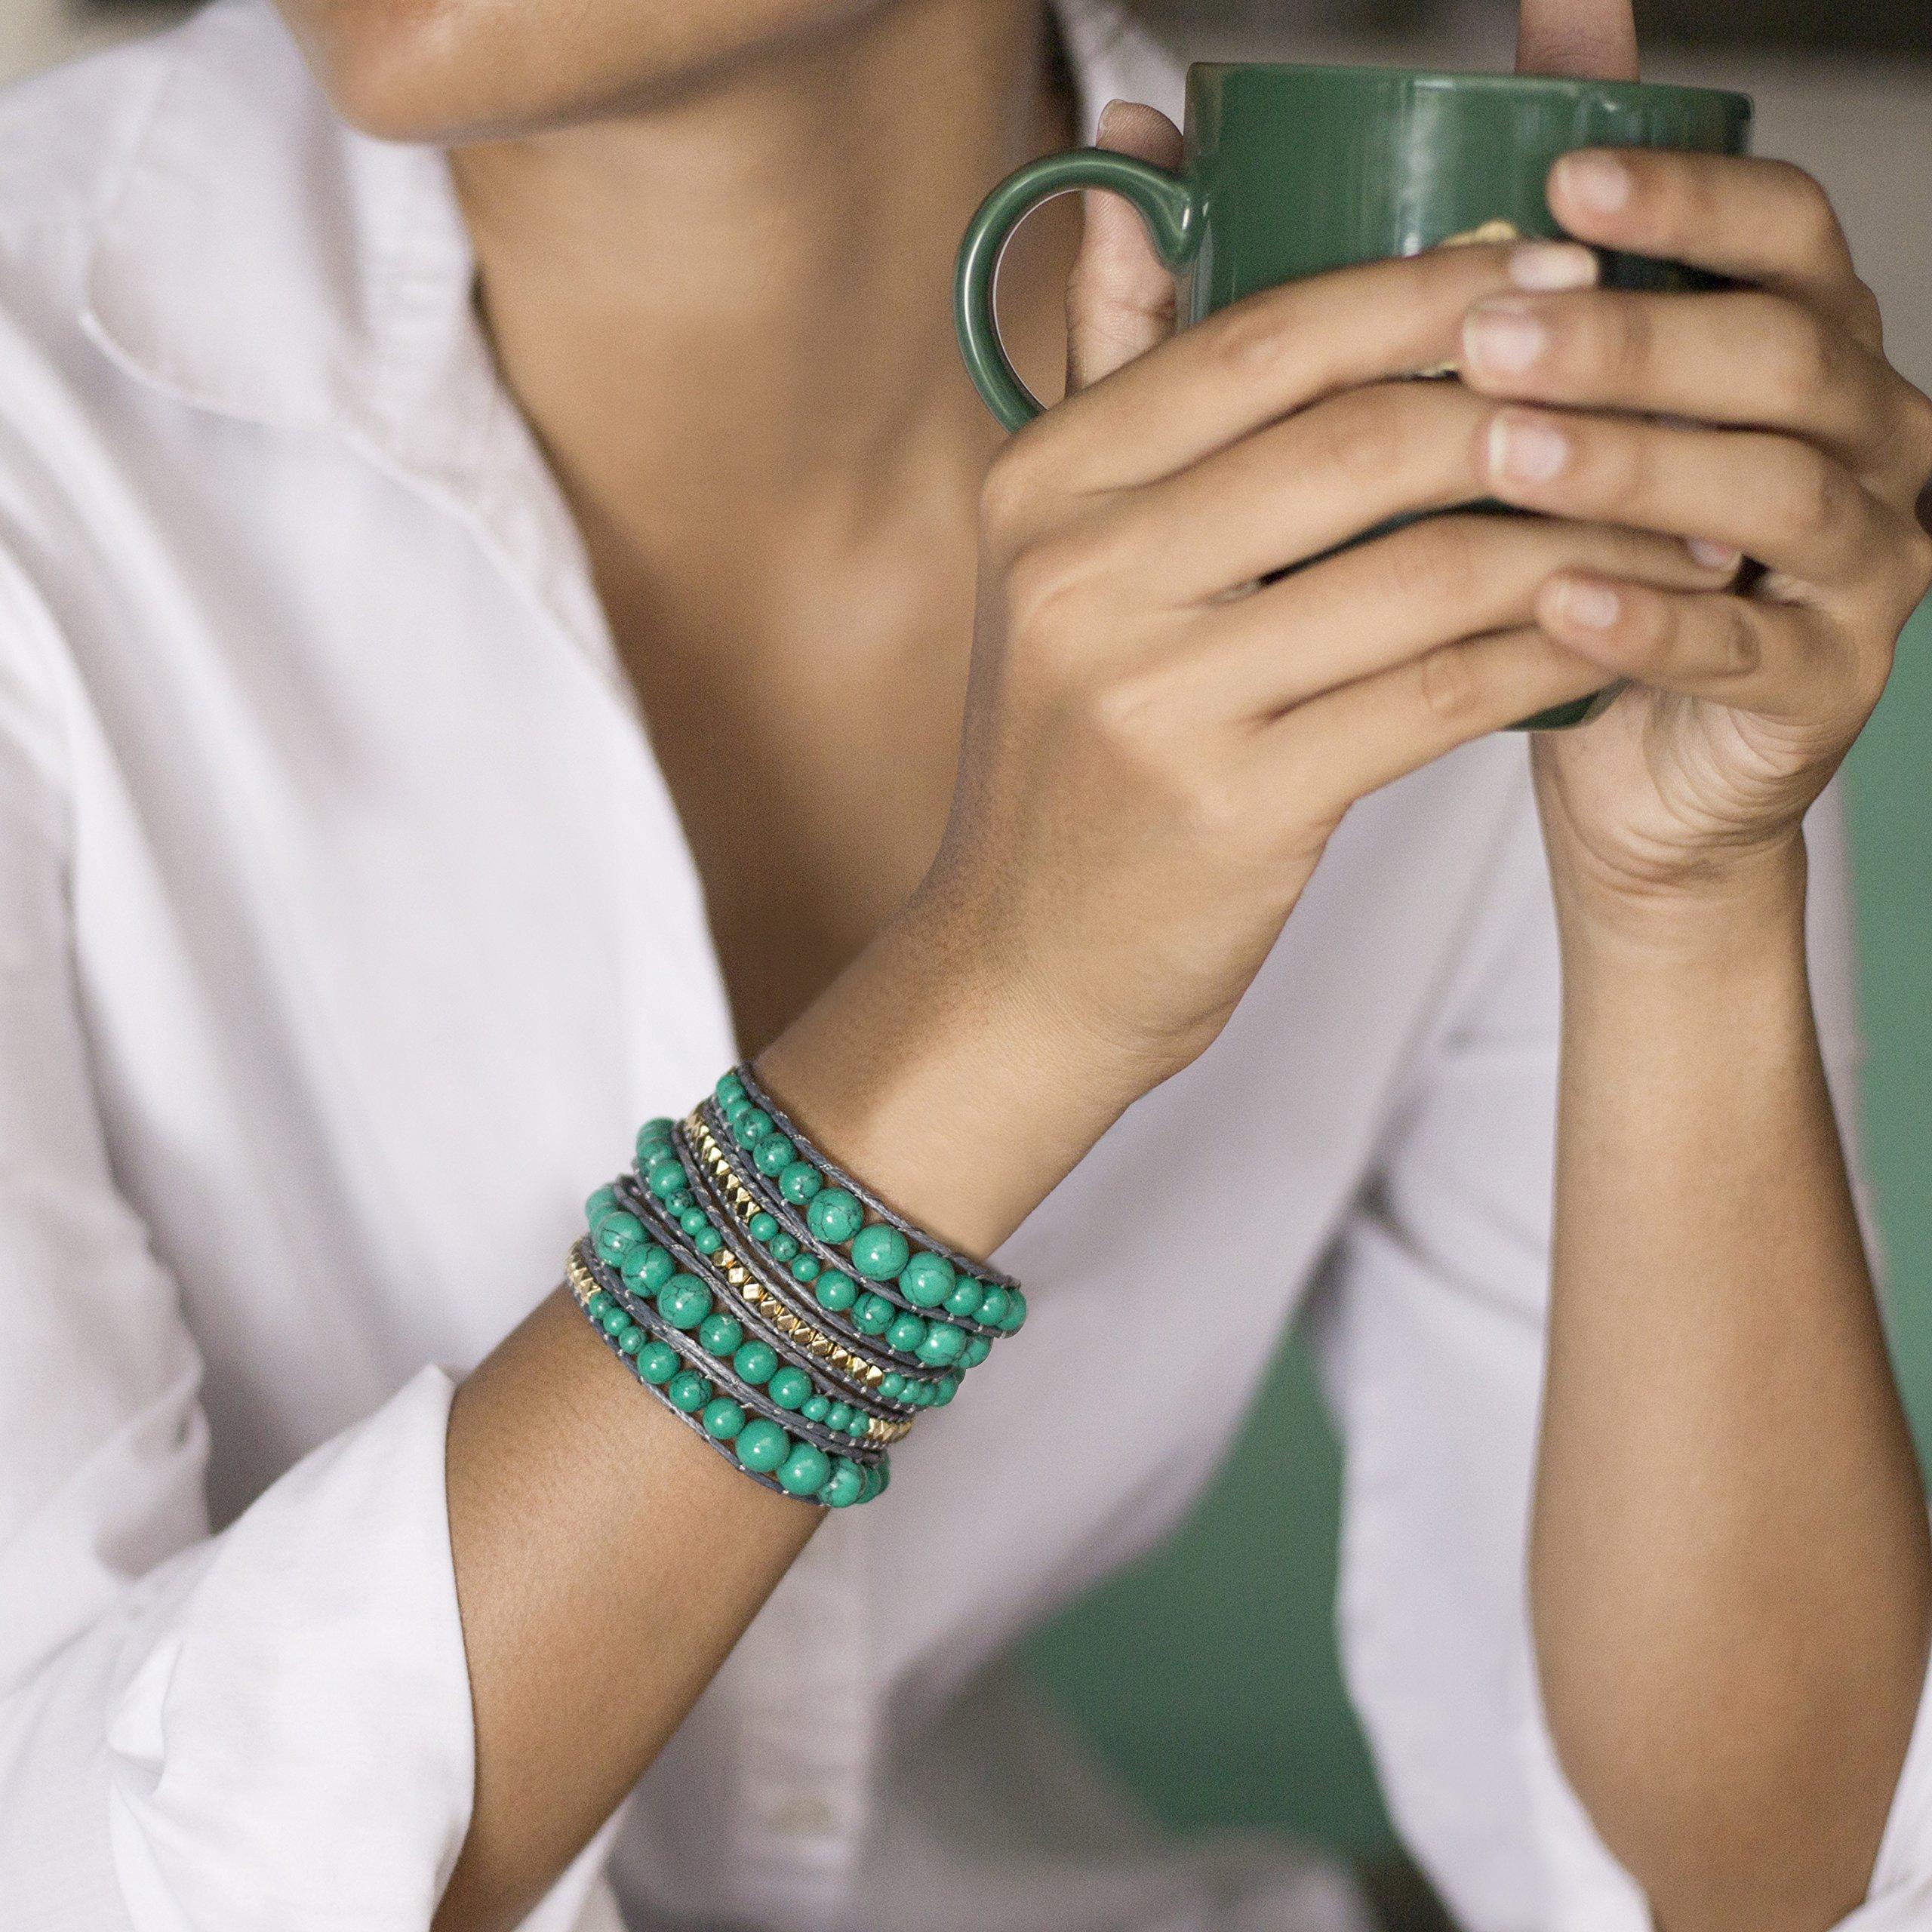 Genuine Stones 5 Wrap Bracelet - Bangle Cuff Rope With Beads - Unisex - Free Size Adjustable (Turquoise) by Sun Life Style (Image #2)